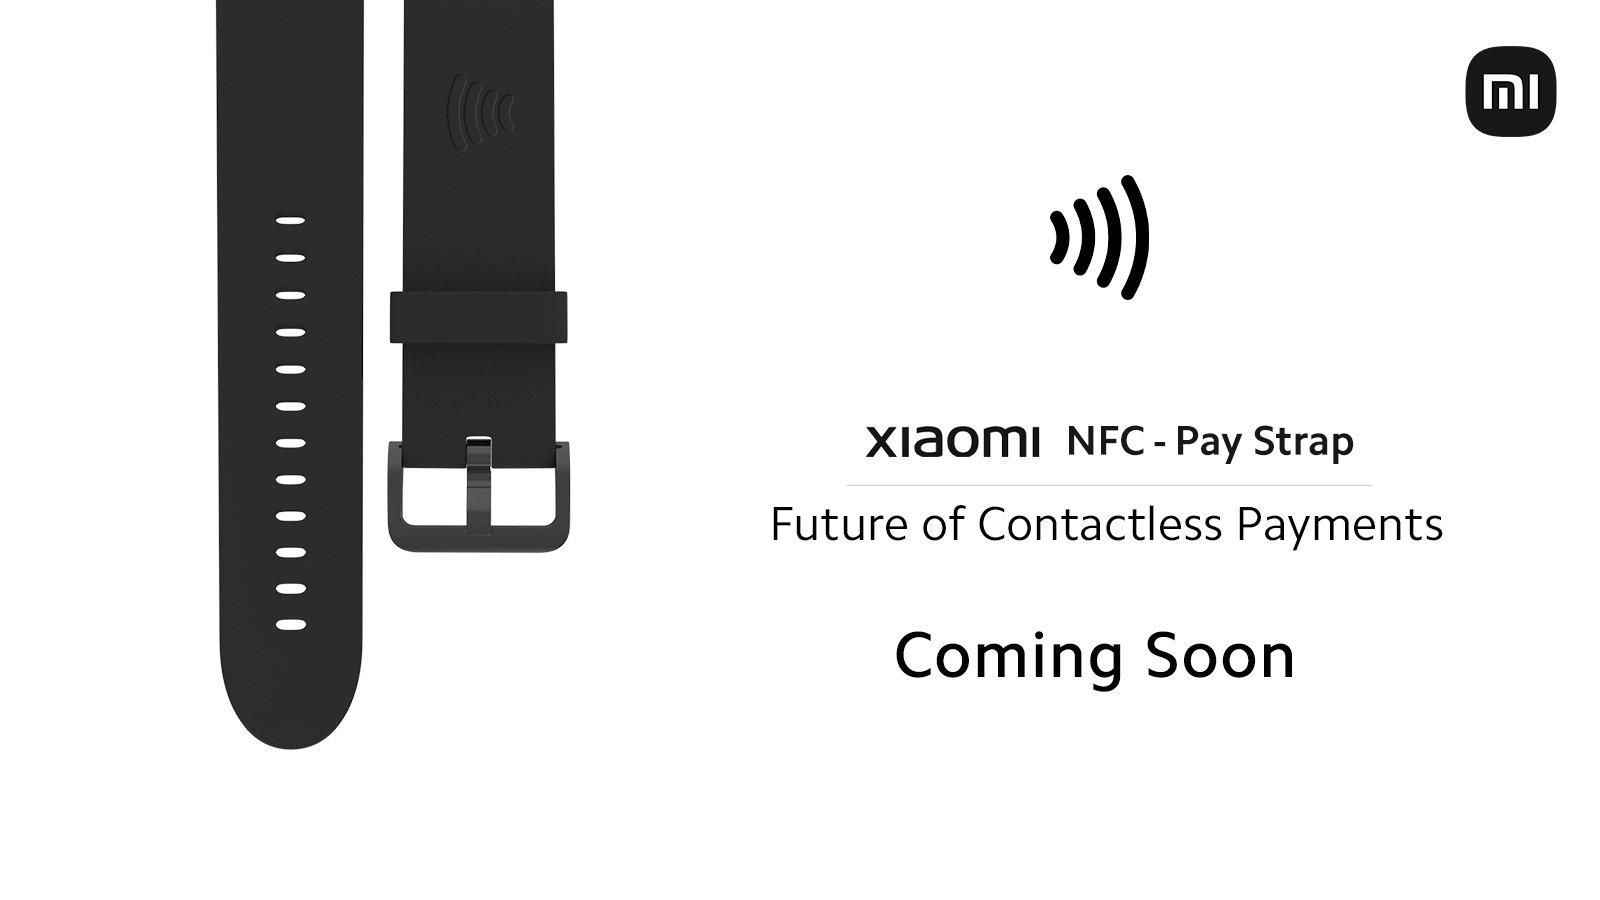 Xiaomi NFC Pay Strap